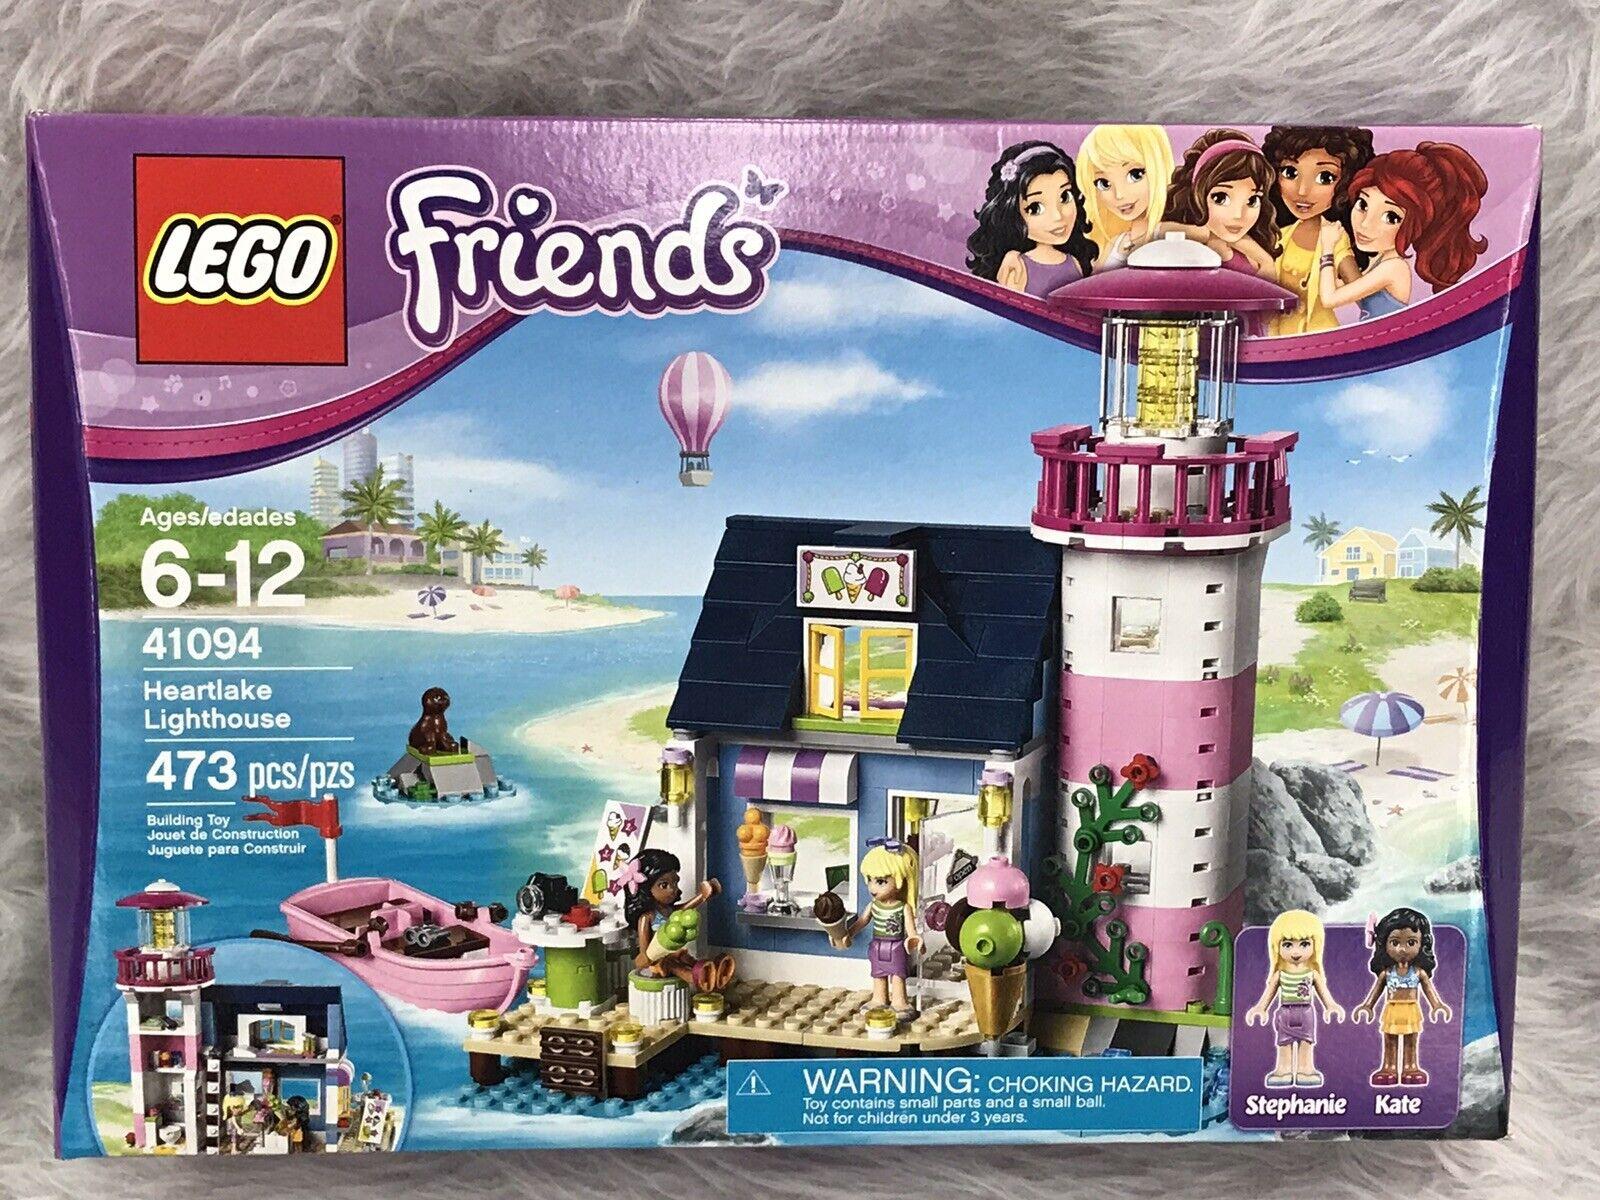 New Lego Friends MiniFigure KATE from Heartlake Lighthouse 41094